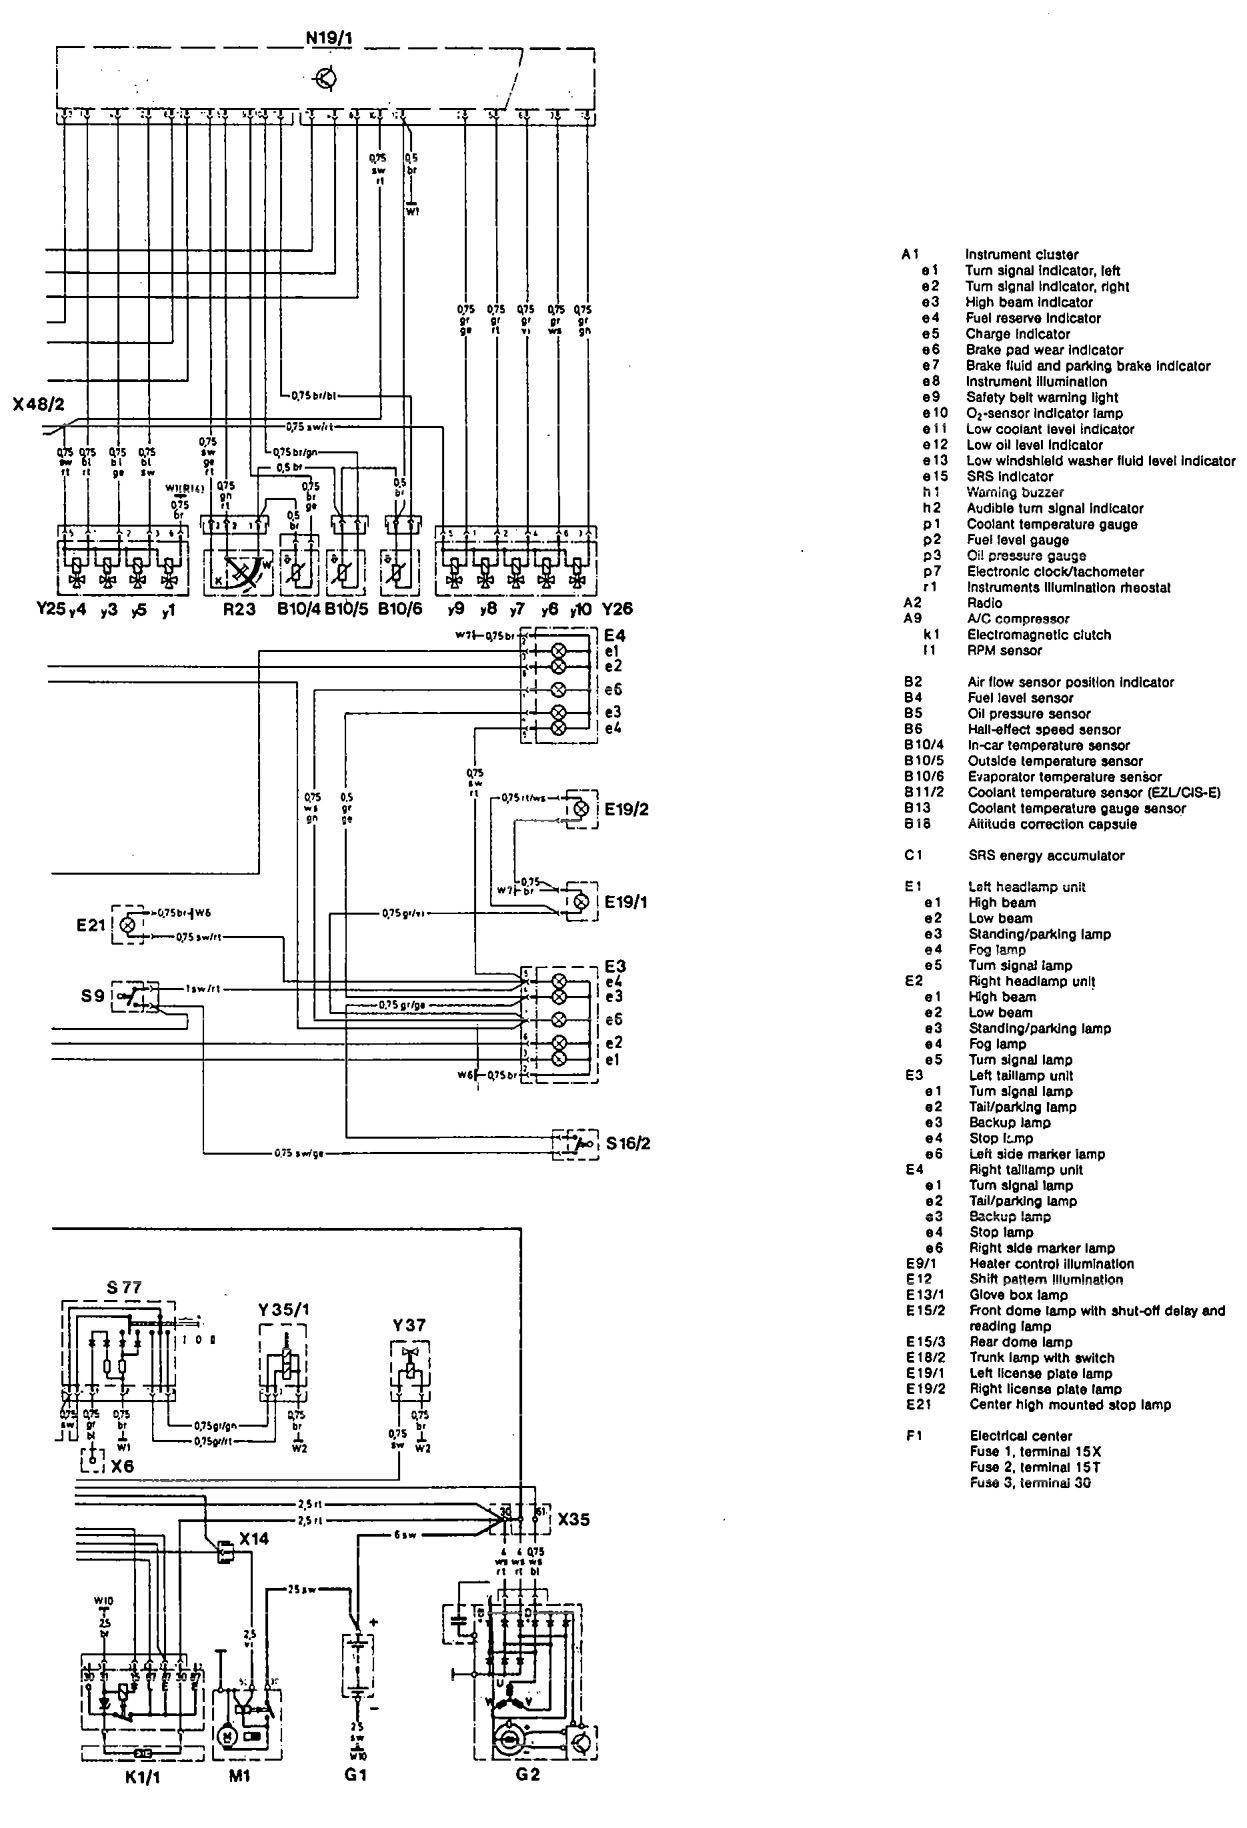 [DIAGRAM_1JK]  SV_9064] Mercedes 190E Wiring Schematic Free Diagram | 1991 Mercedes Benz 190e 2 3 Radio Wiring |  | Spoat Jebrp Proe Hendil Mohammedshrine Librar Wiring 101